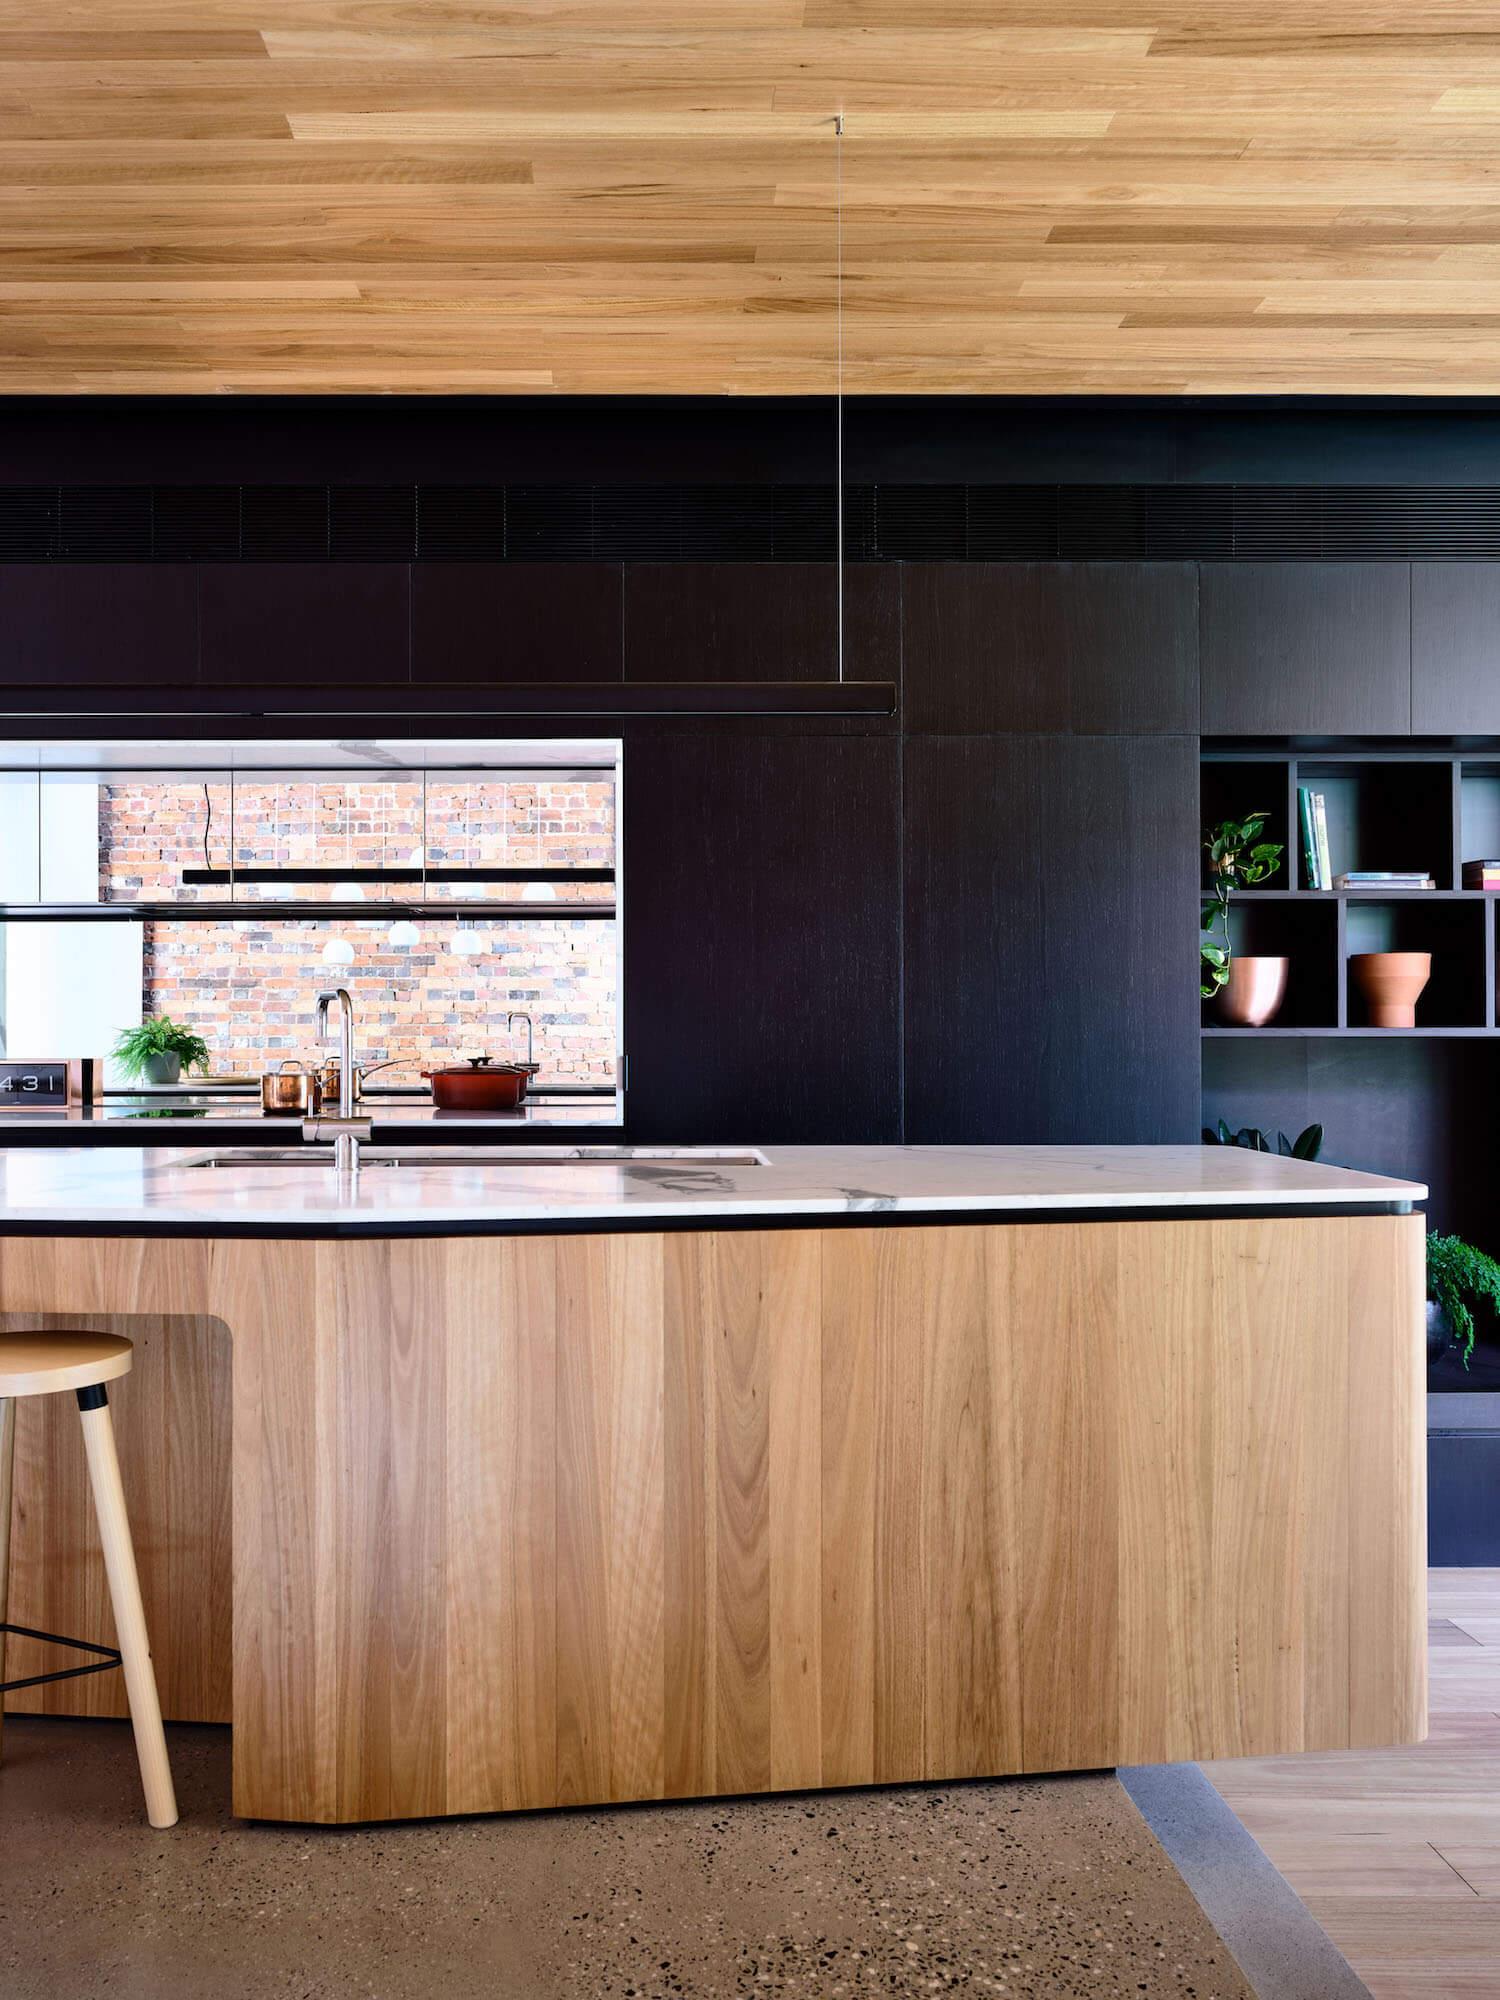 Est living interview matt gibson architecture and design 8